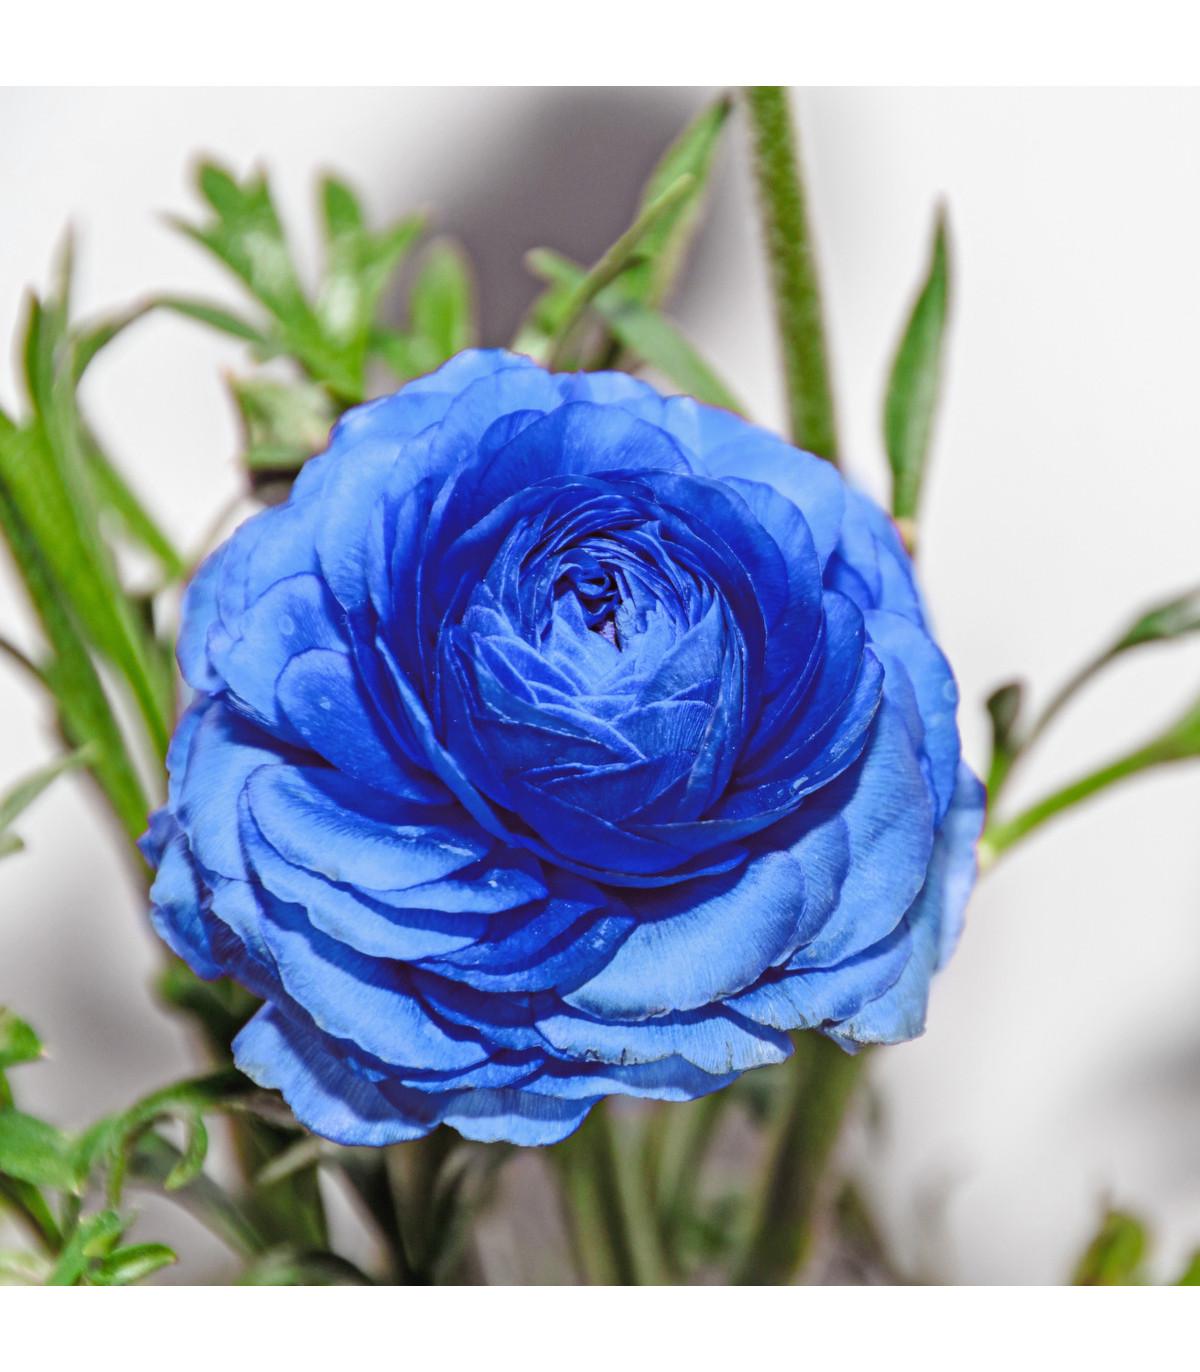 Iskerník plnokvetý modrý - Ranunculus Asiaticus - cibuľoviny - 3 ks